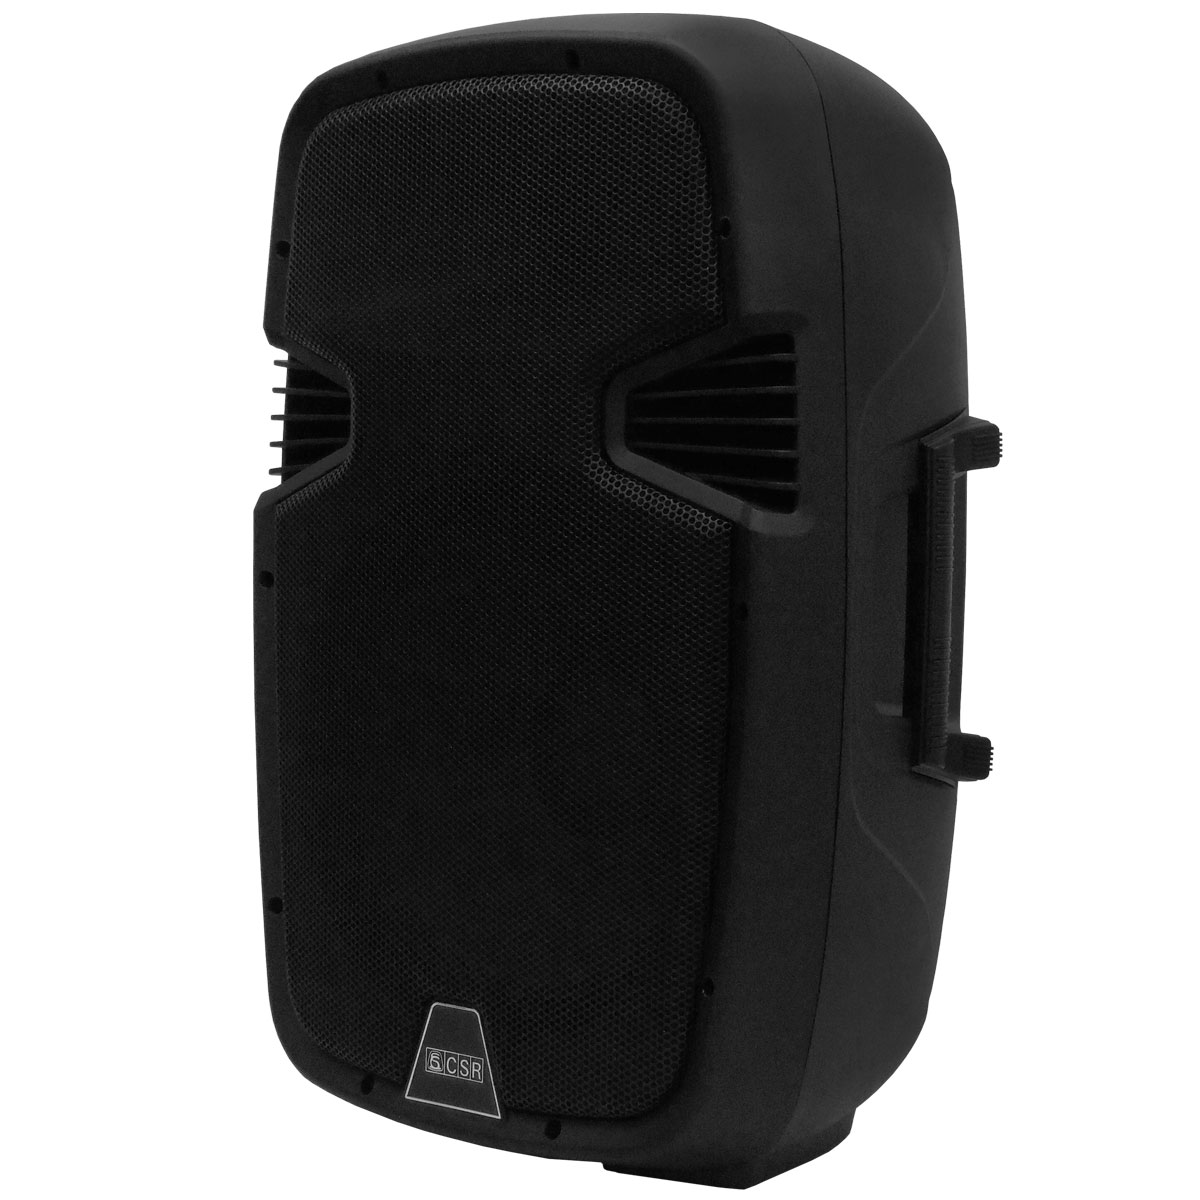 5512USB - Caixa Ativa 200W c/ Bluetooth e USB CSR 5512 USB - CSR